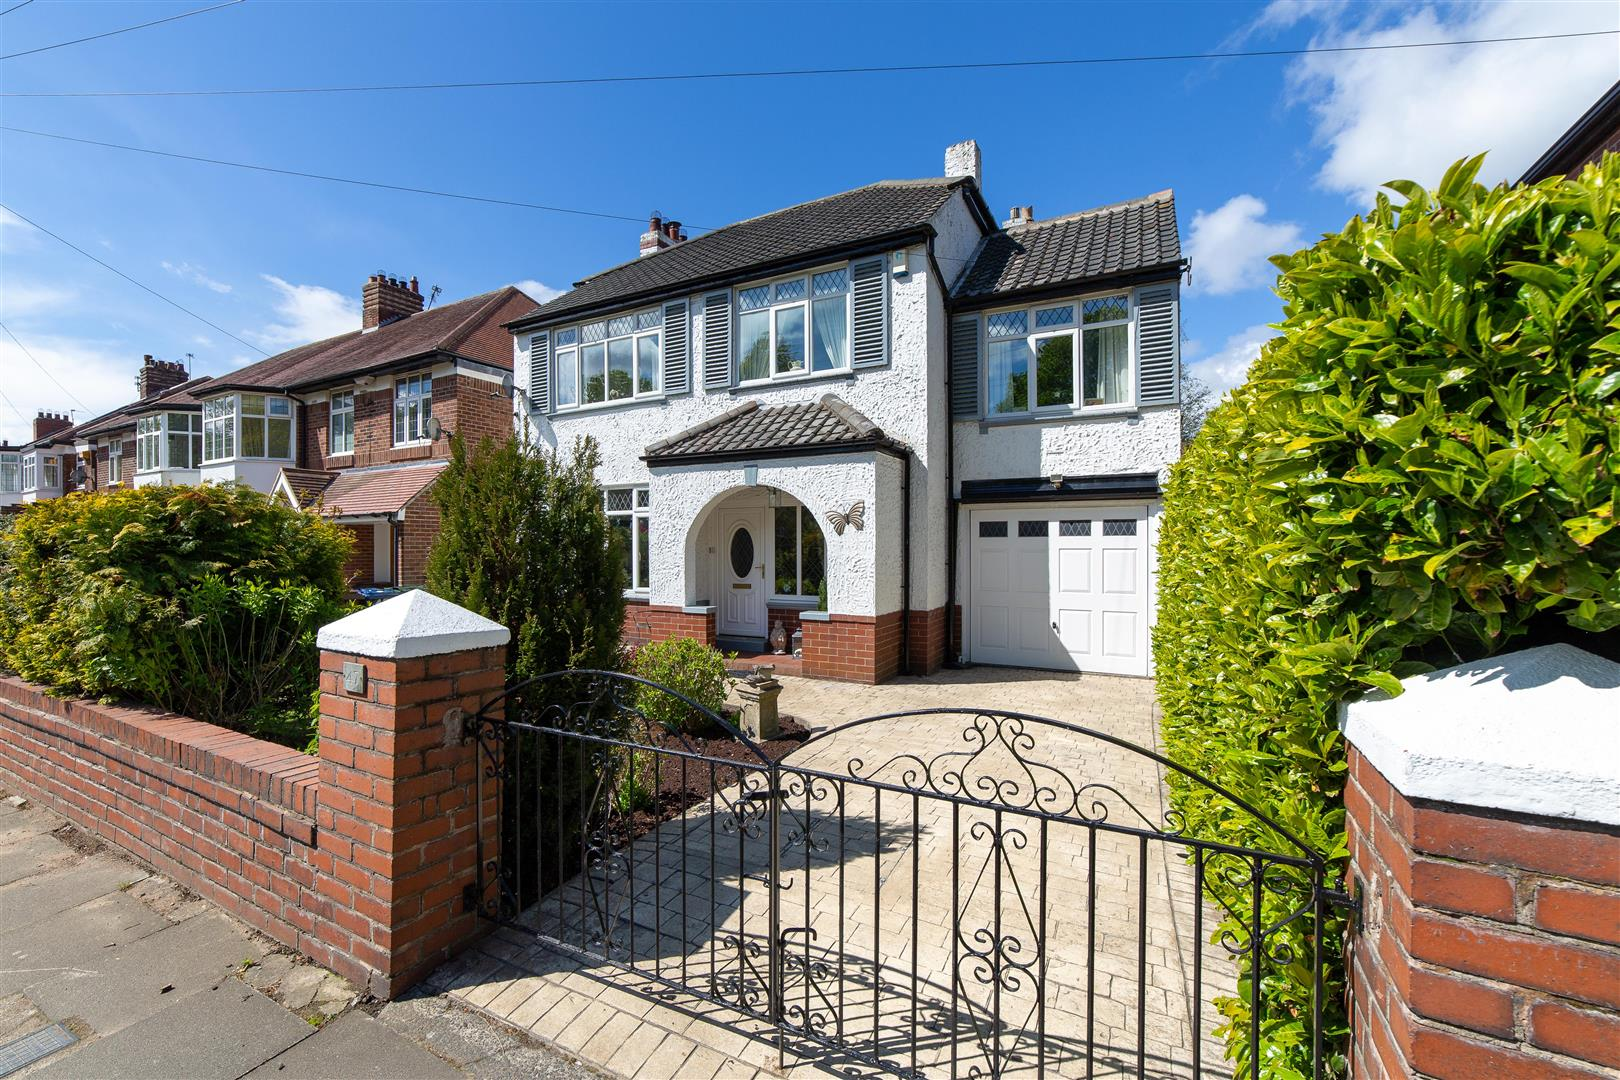 4 bed detached house for sale in Great North Road, Brunton Park, NE3